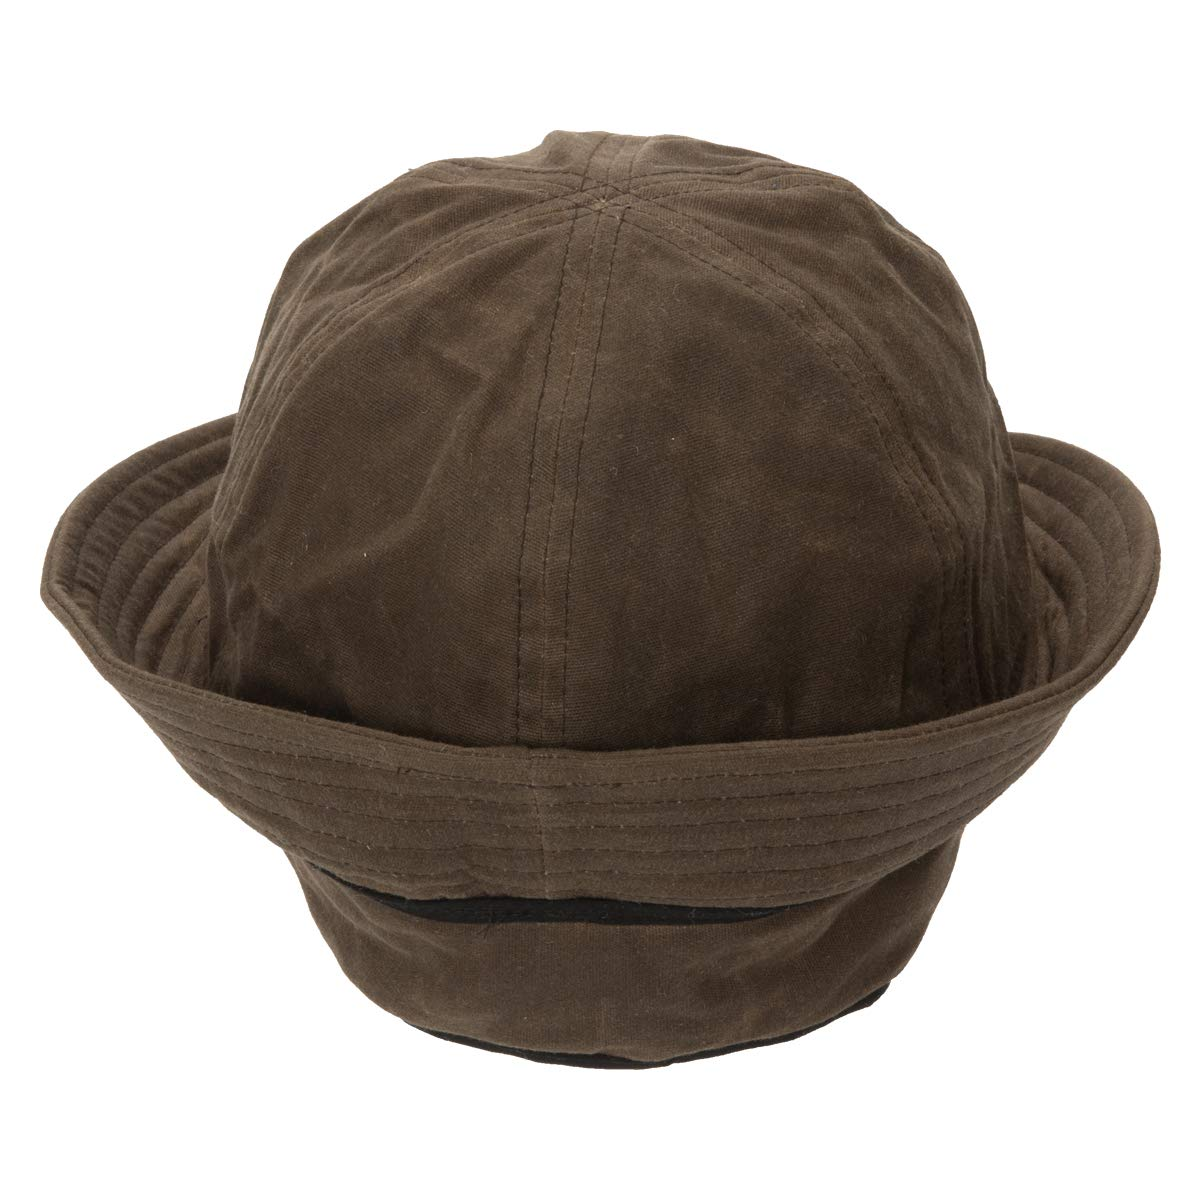 35246dd1e608b Amazon.com : Avery Hunting Gear Heritage Jones Cap-Large : Sports & Outdoors